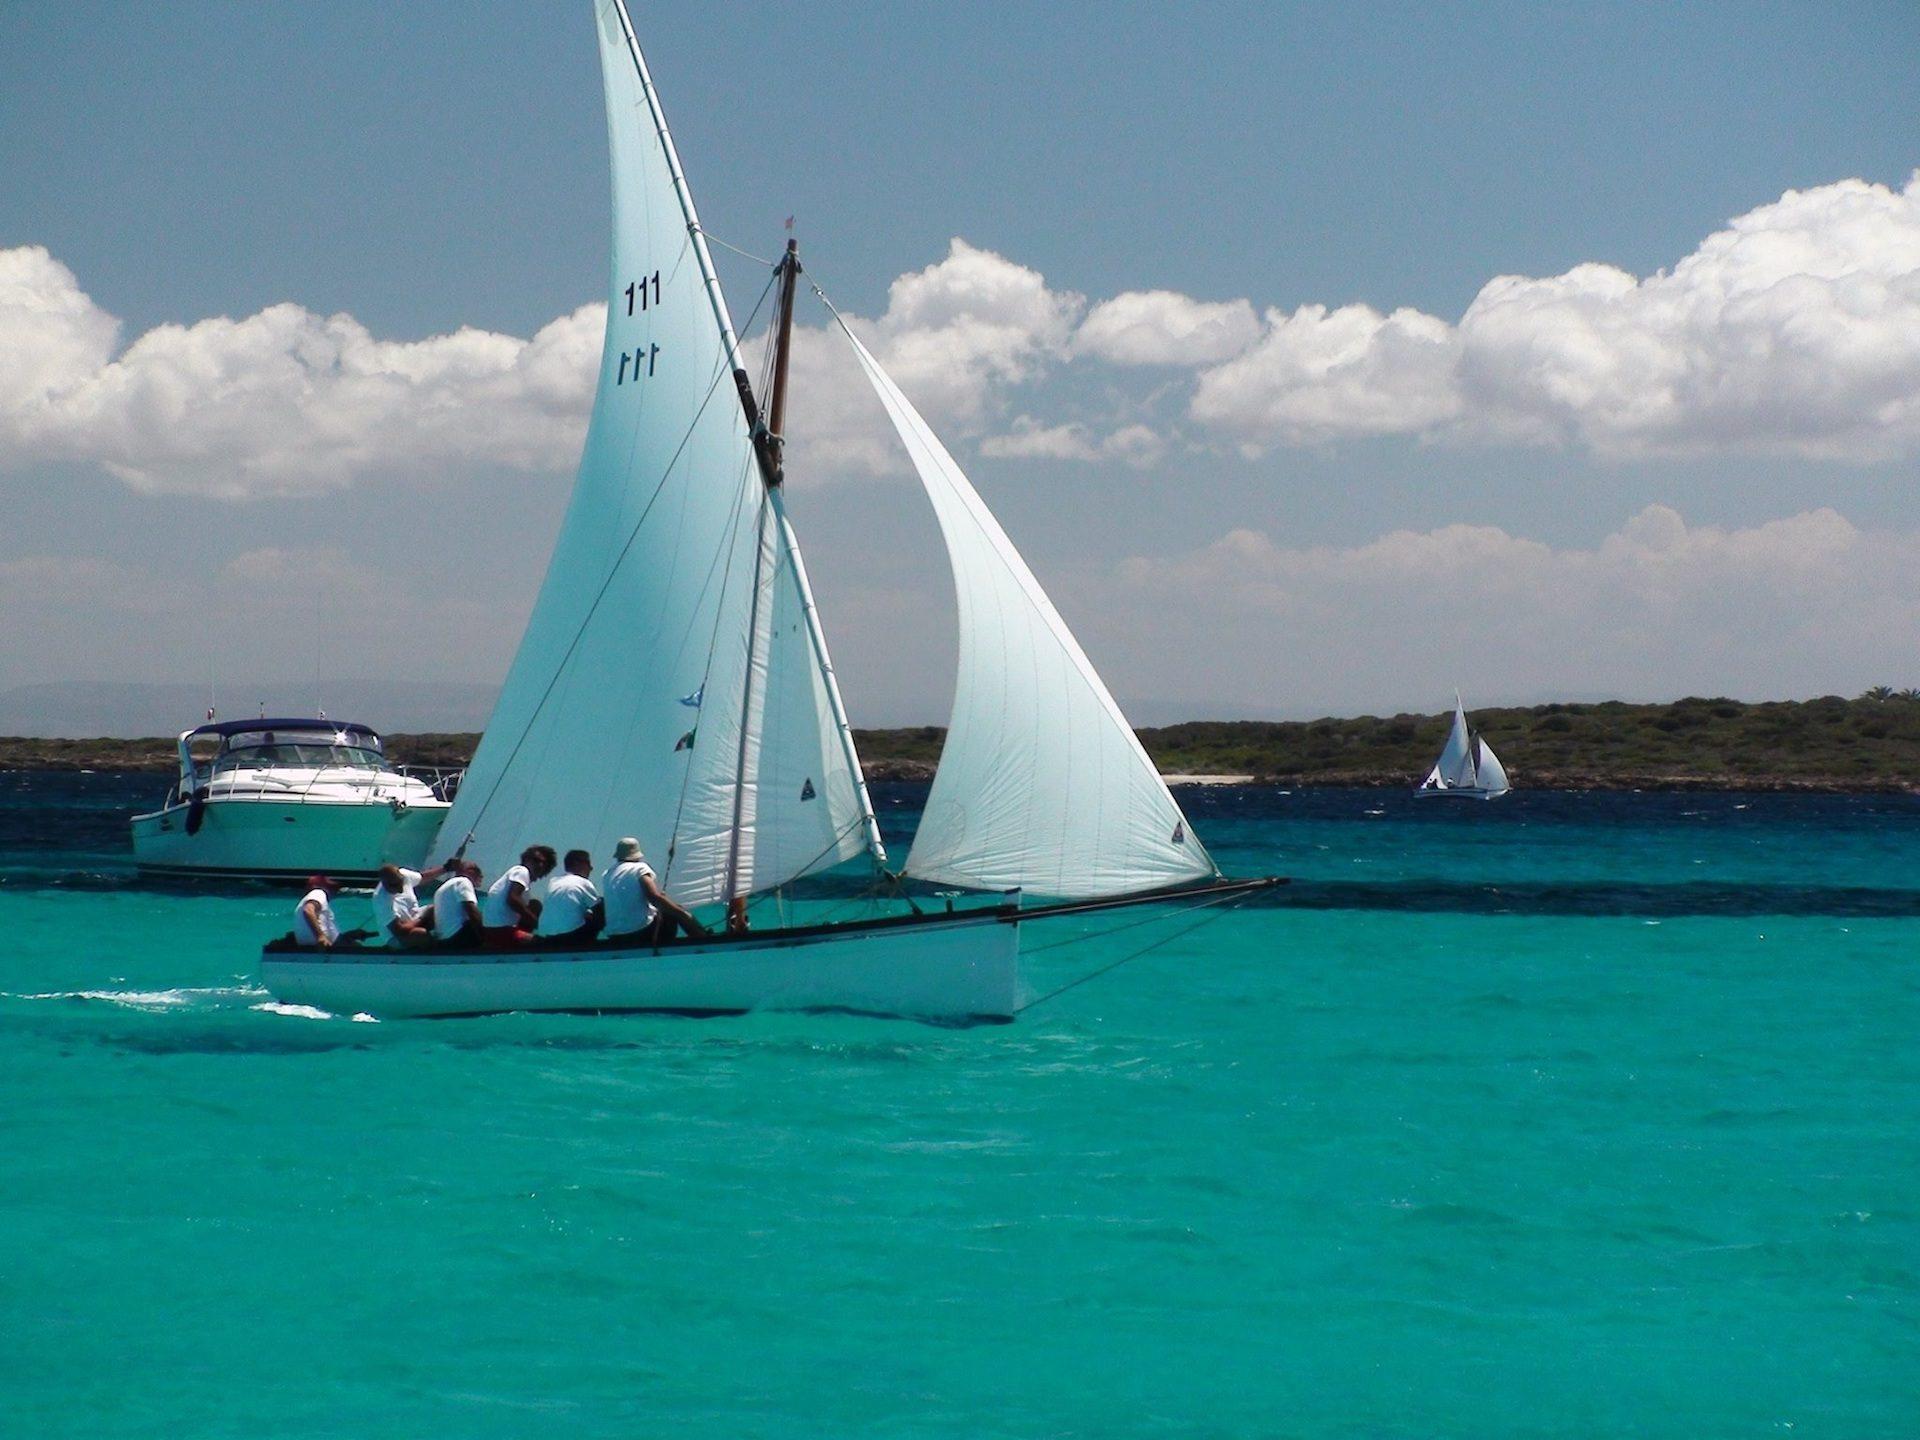 barco, vela, mar, cristalino, turquesa, viento - Fondos de Pantalla HD - professor-falken.com